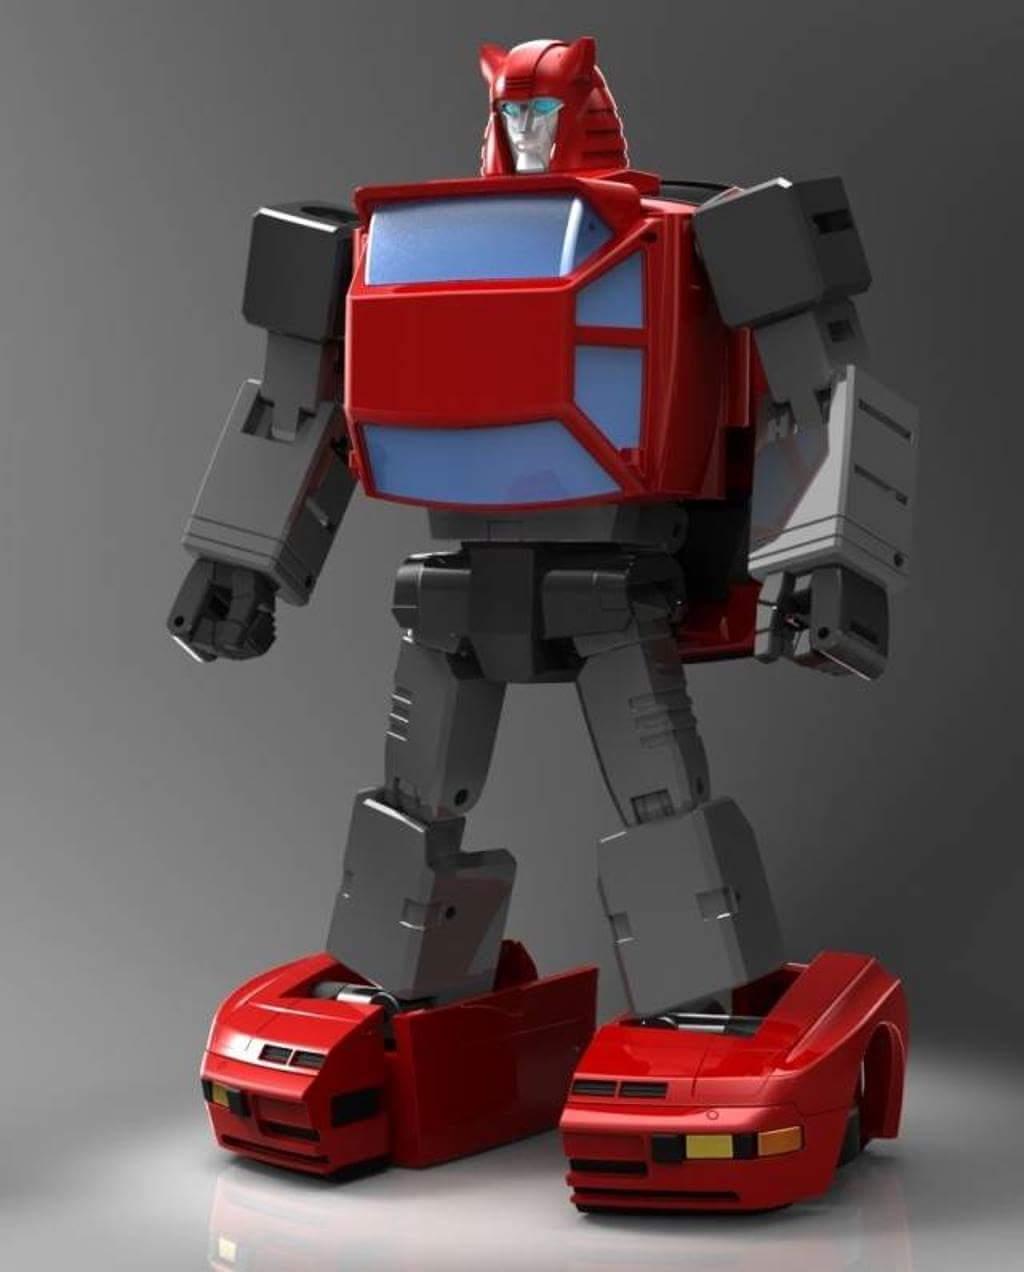 [X-Transbots] Produit Tiers - Minibots MP - Gamme MM - Page 9 R1aLKdkT